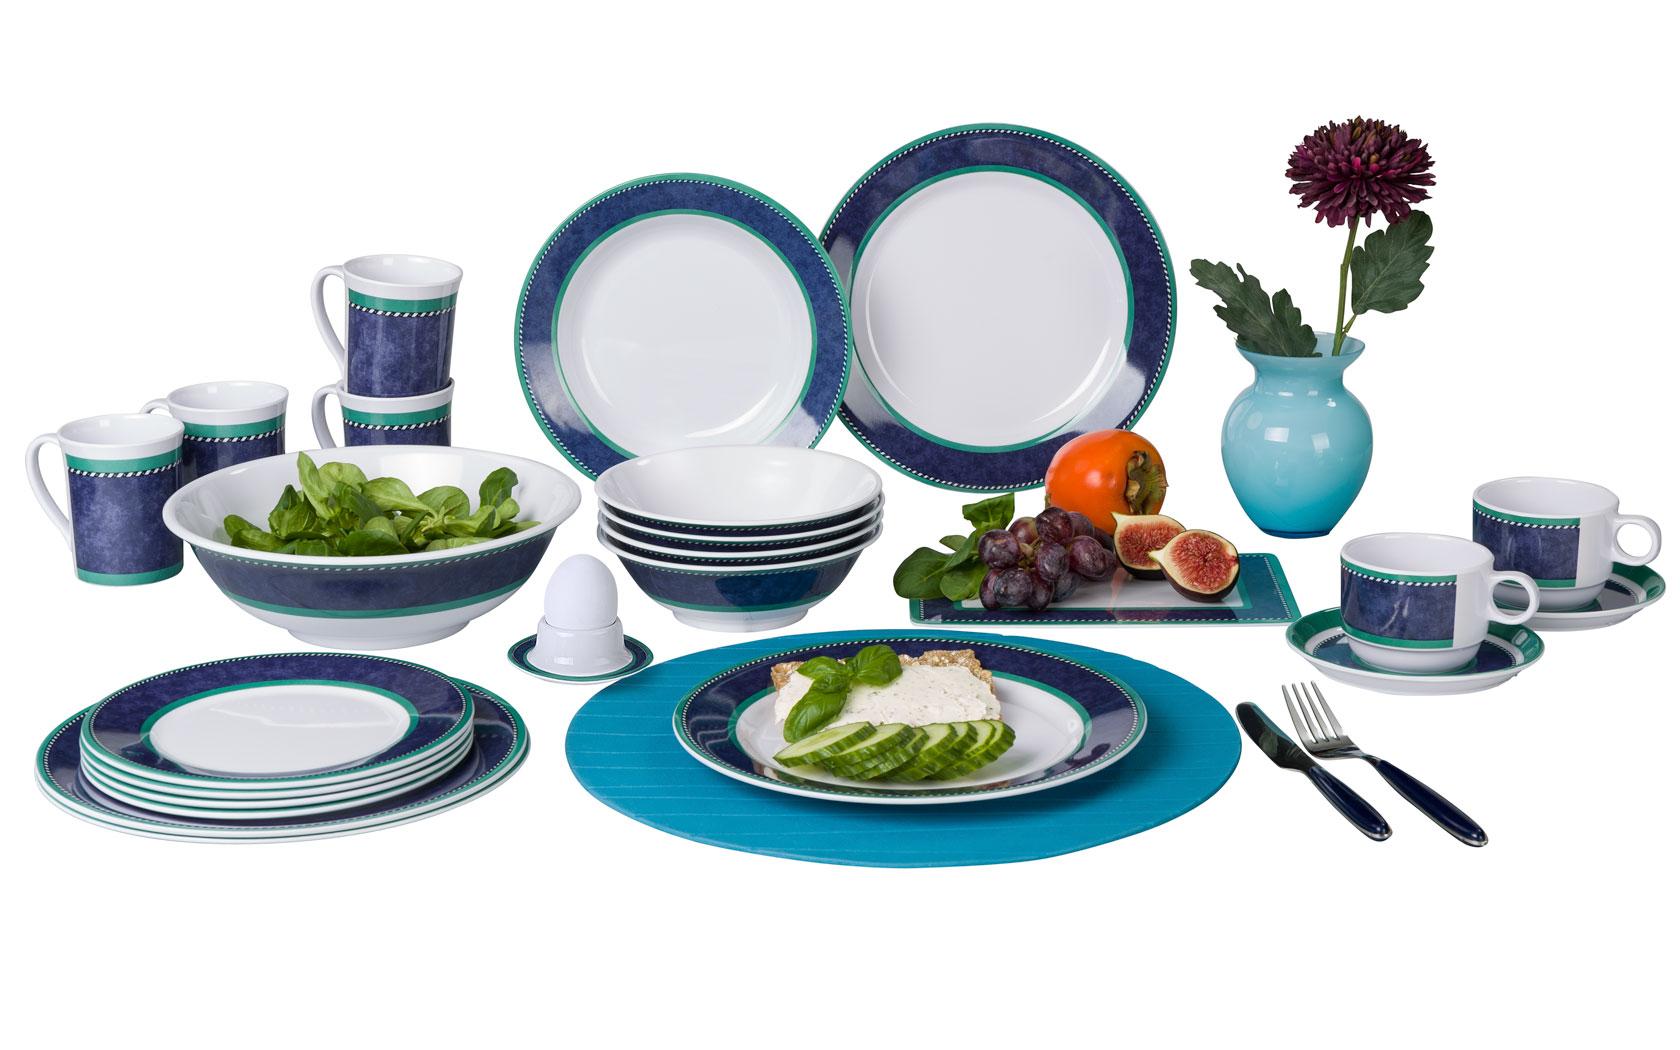 Marble blue Dessertteller | 04024374622169